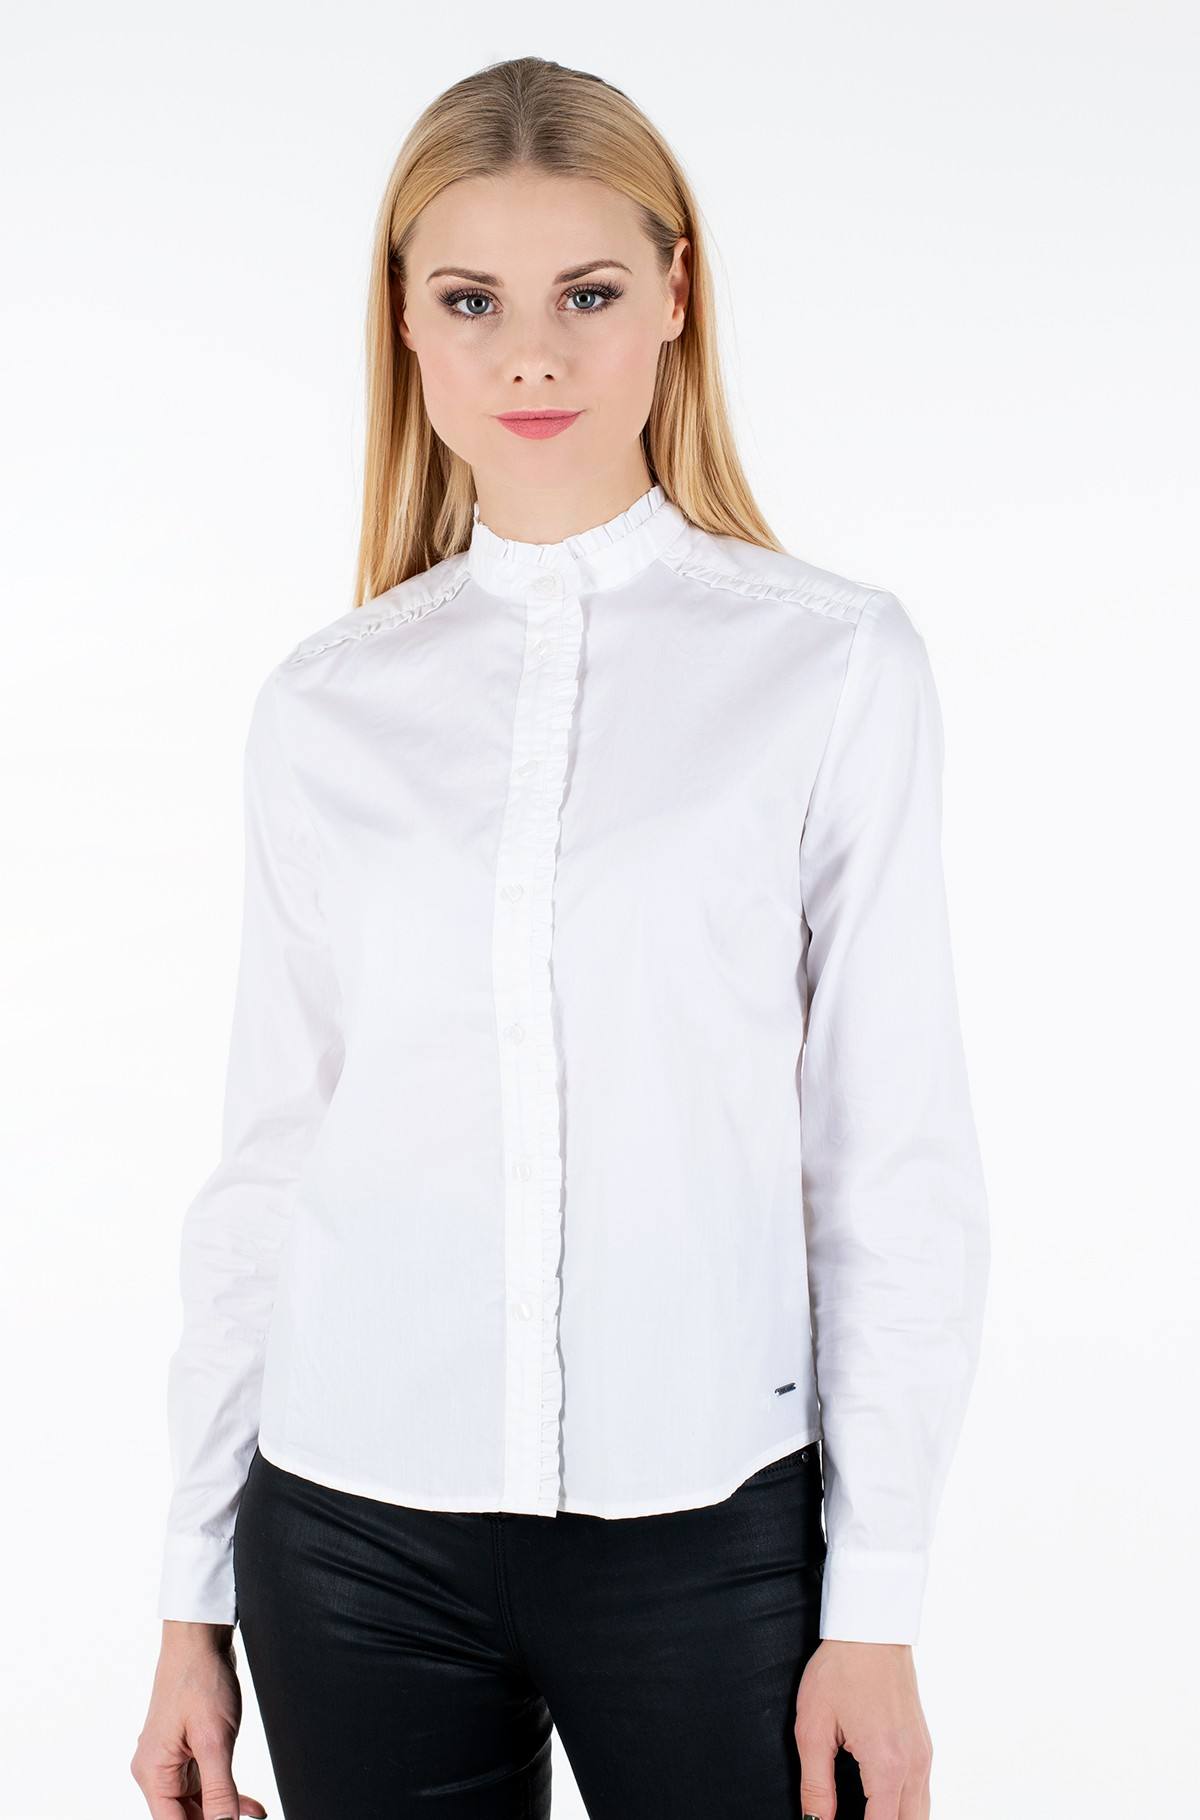 Marškiniai ZABILA/PL303844-full-1